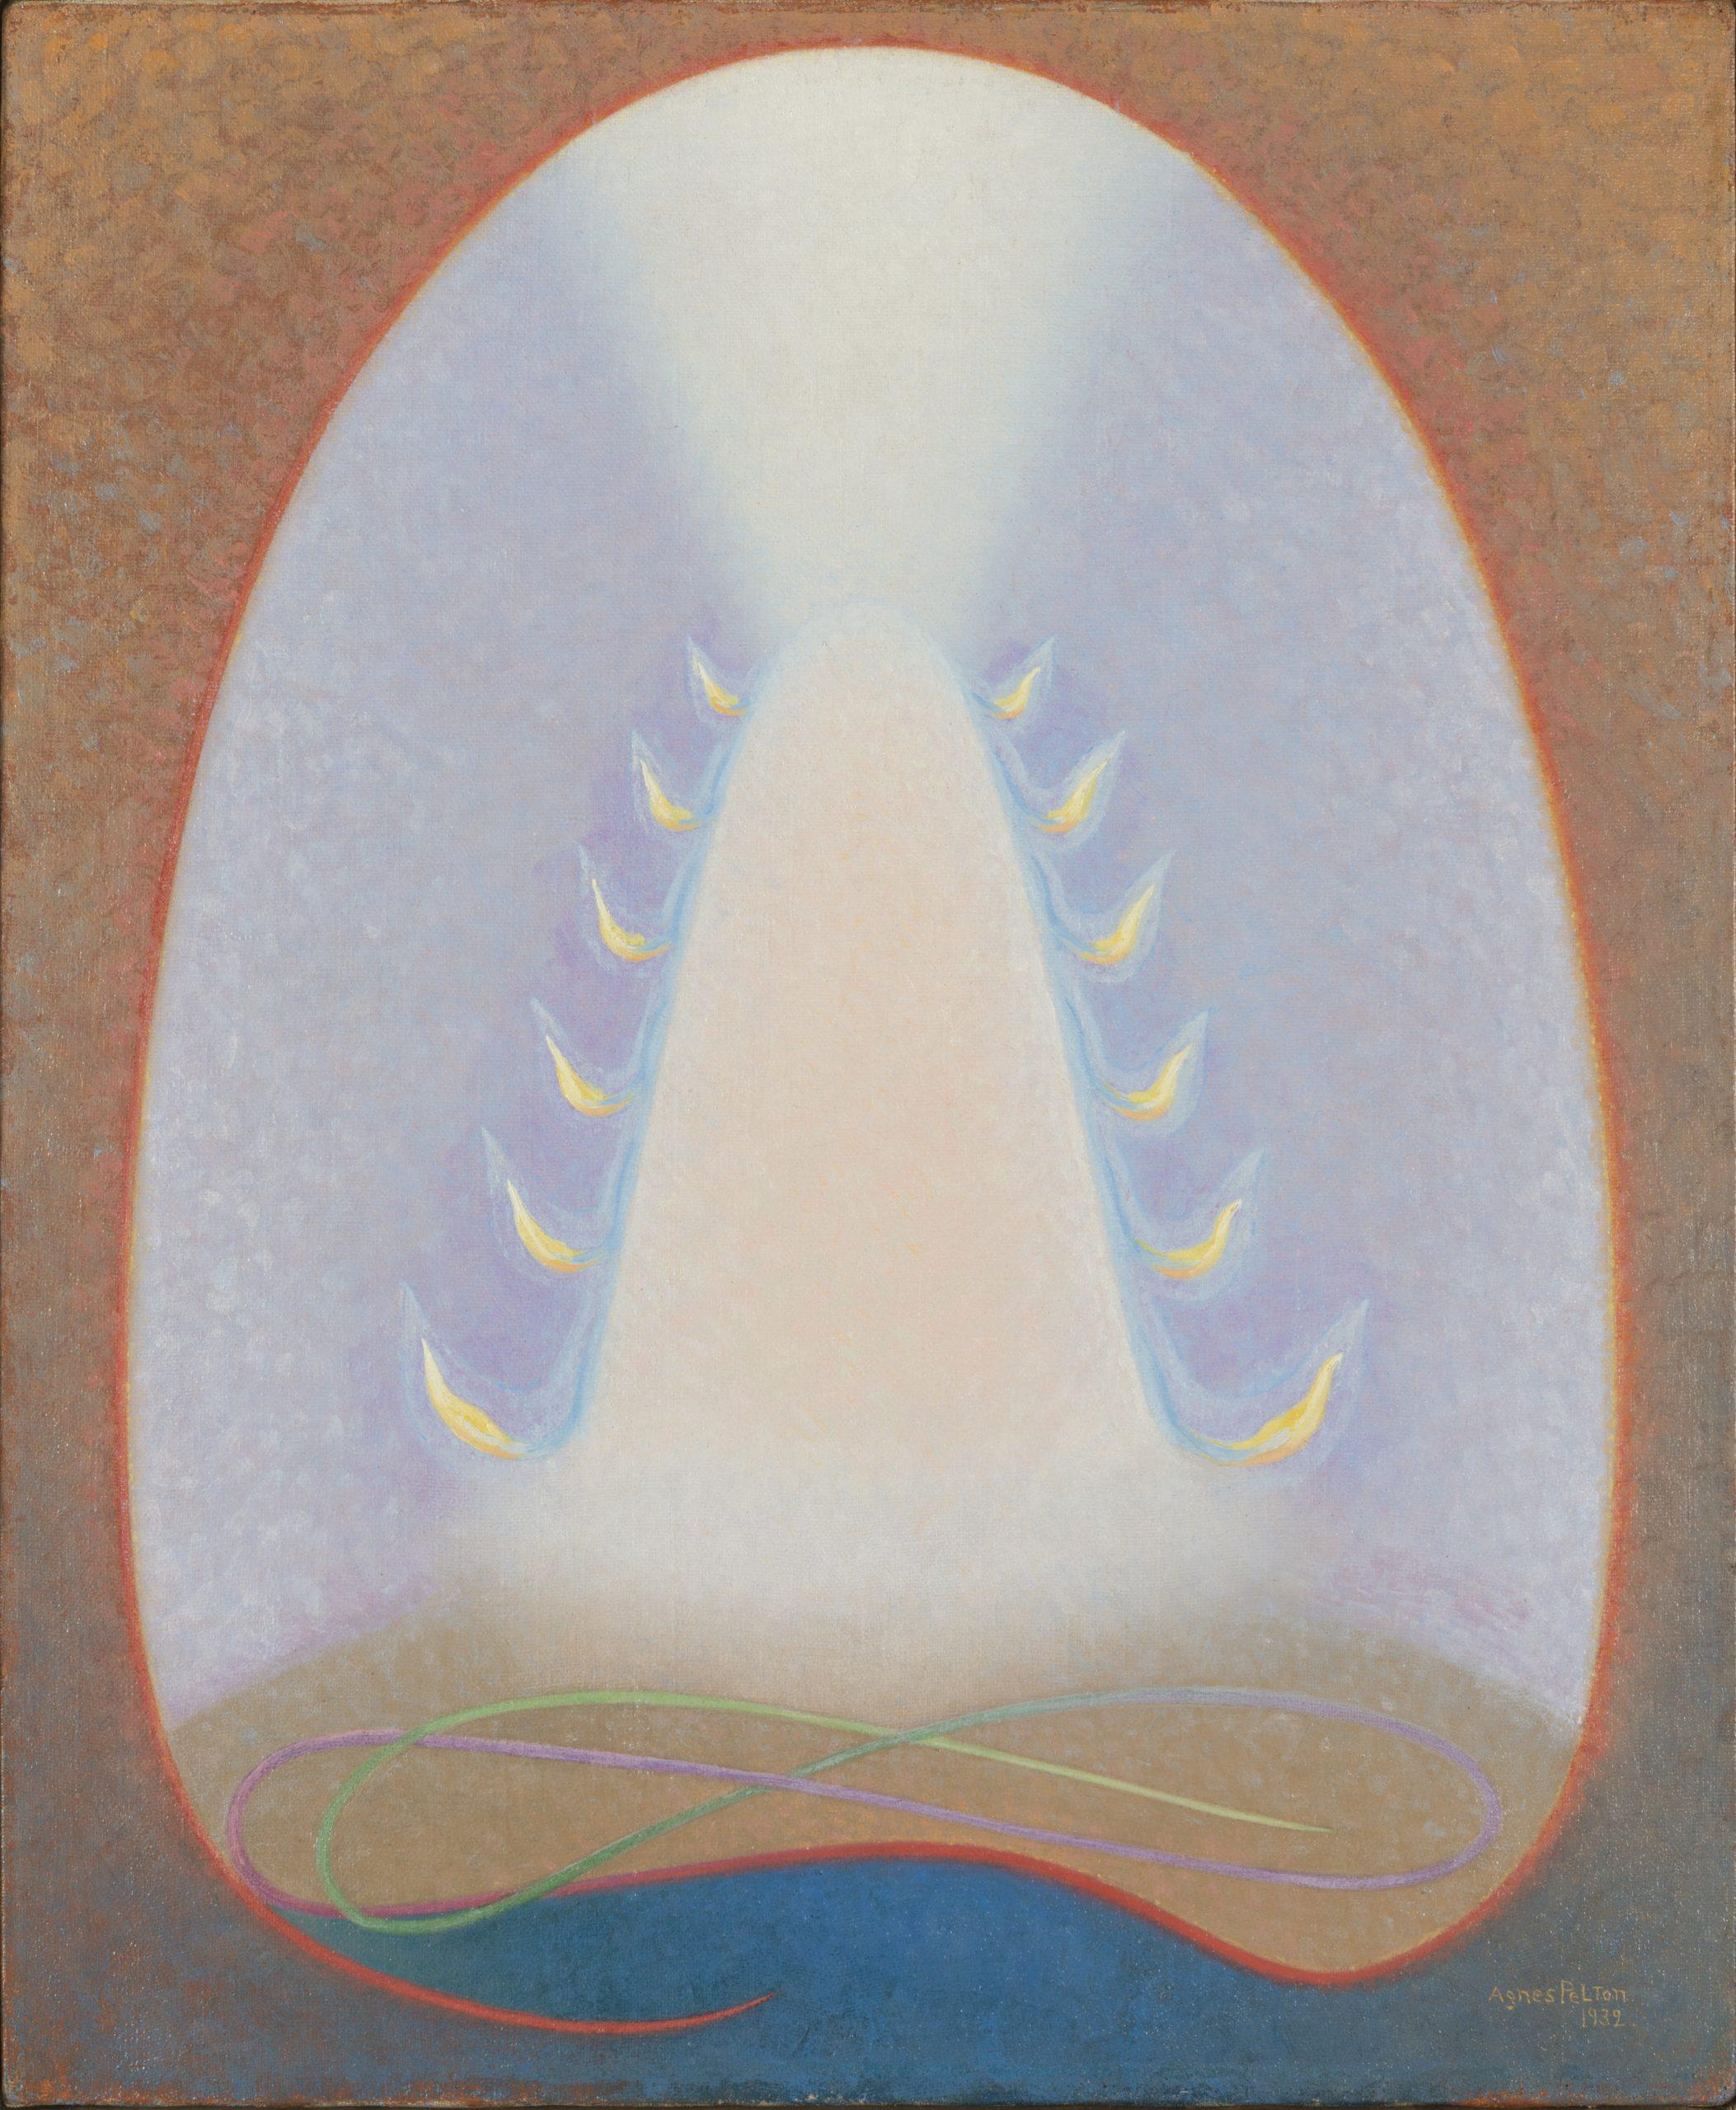 Agnes Pelton, Mount of Flame, 1932, Oil on canvas, Bequest of Raymond Jonson, Raymond Jonson Collection